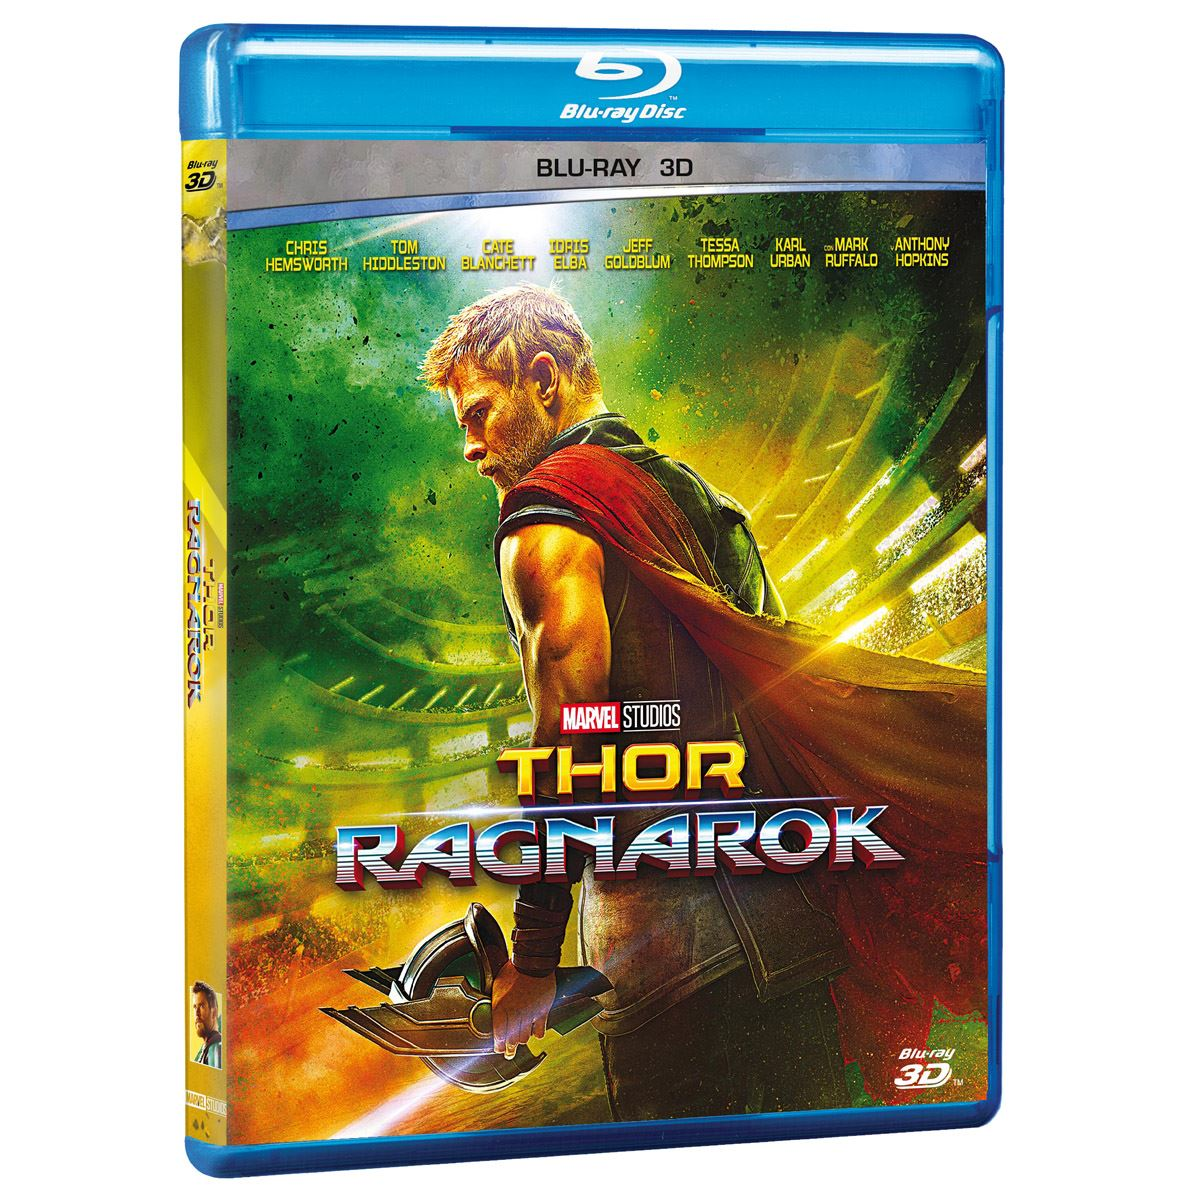 BR 3D Thor Ragnarok